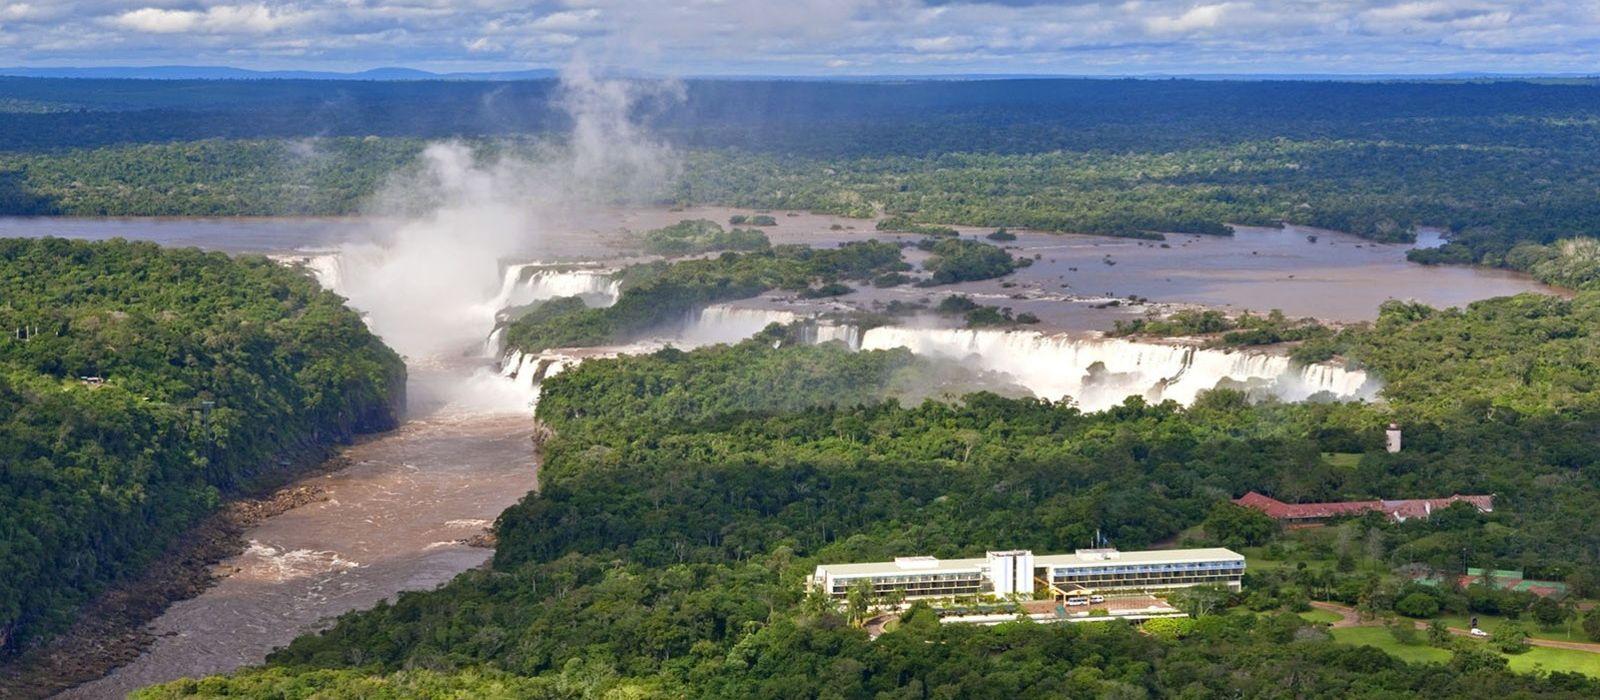 Glaciers, Wildlife & Waterfalls in Argentina Tour Trip 6